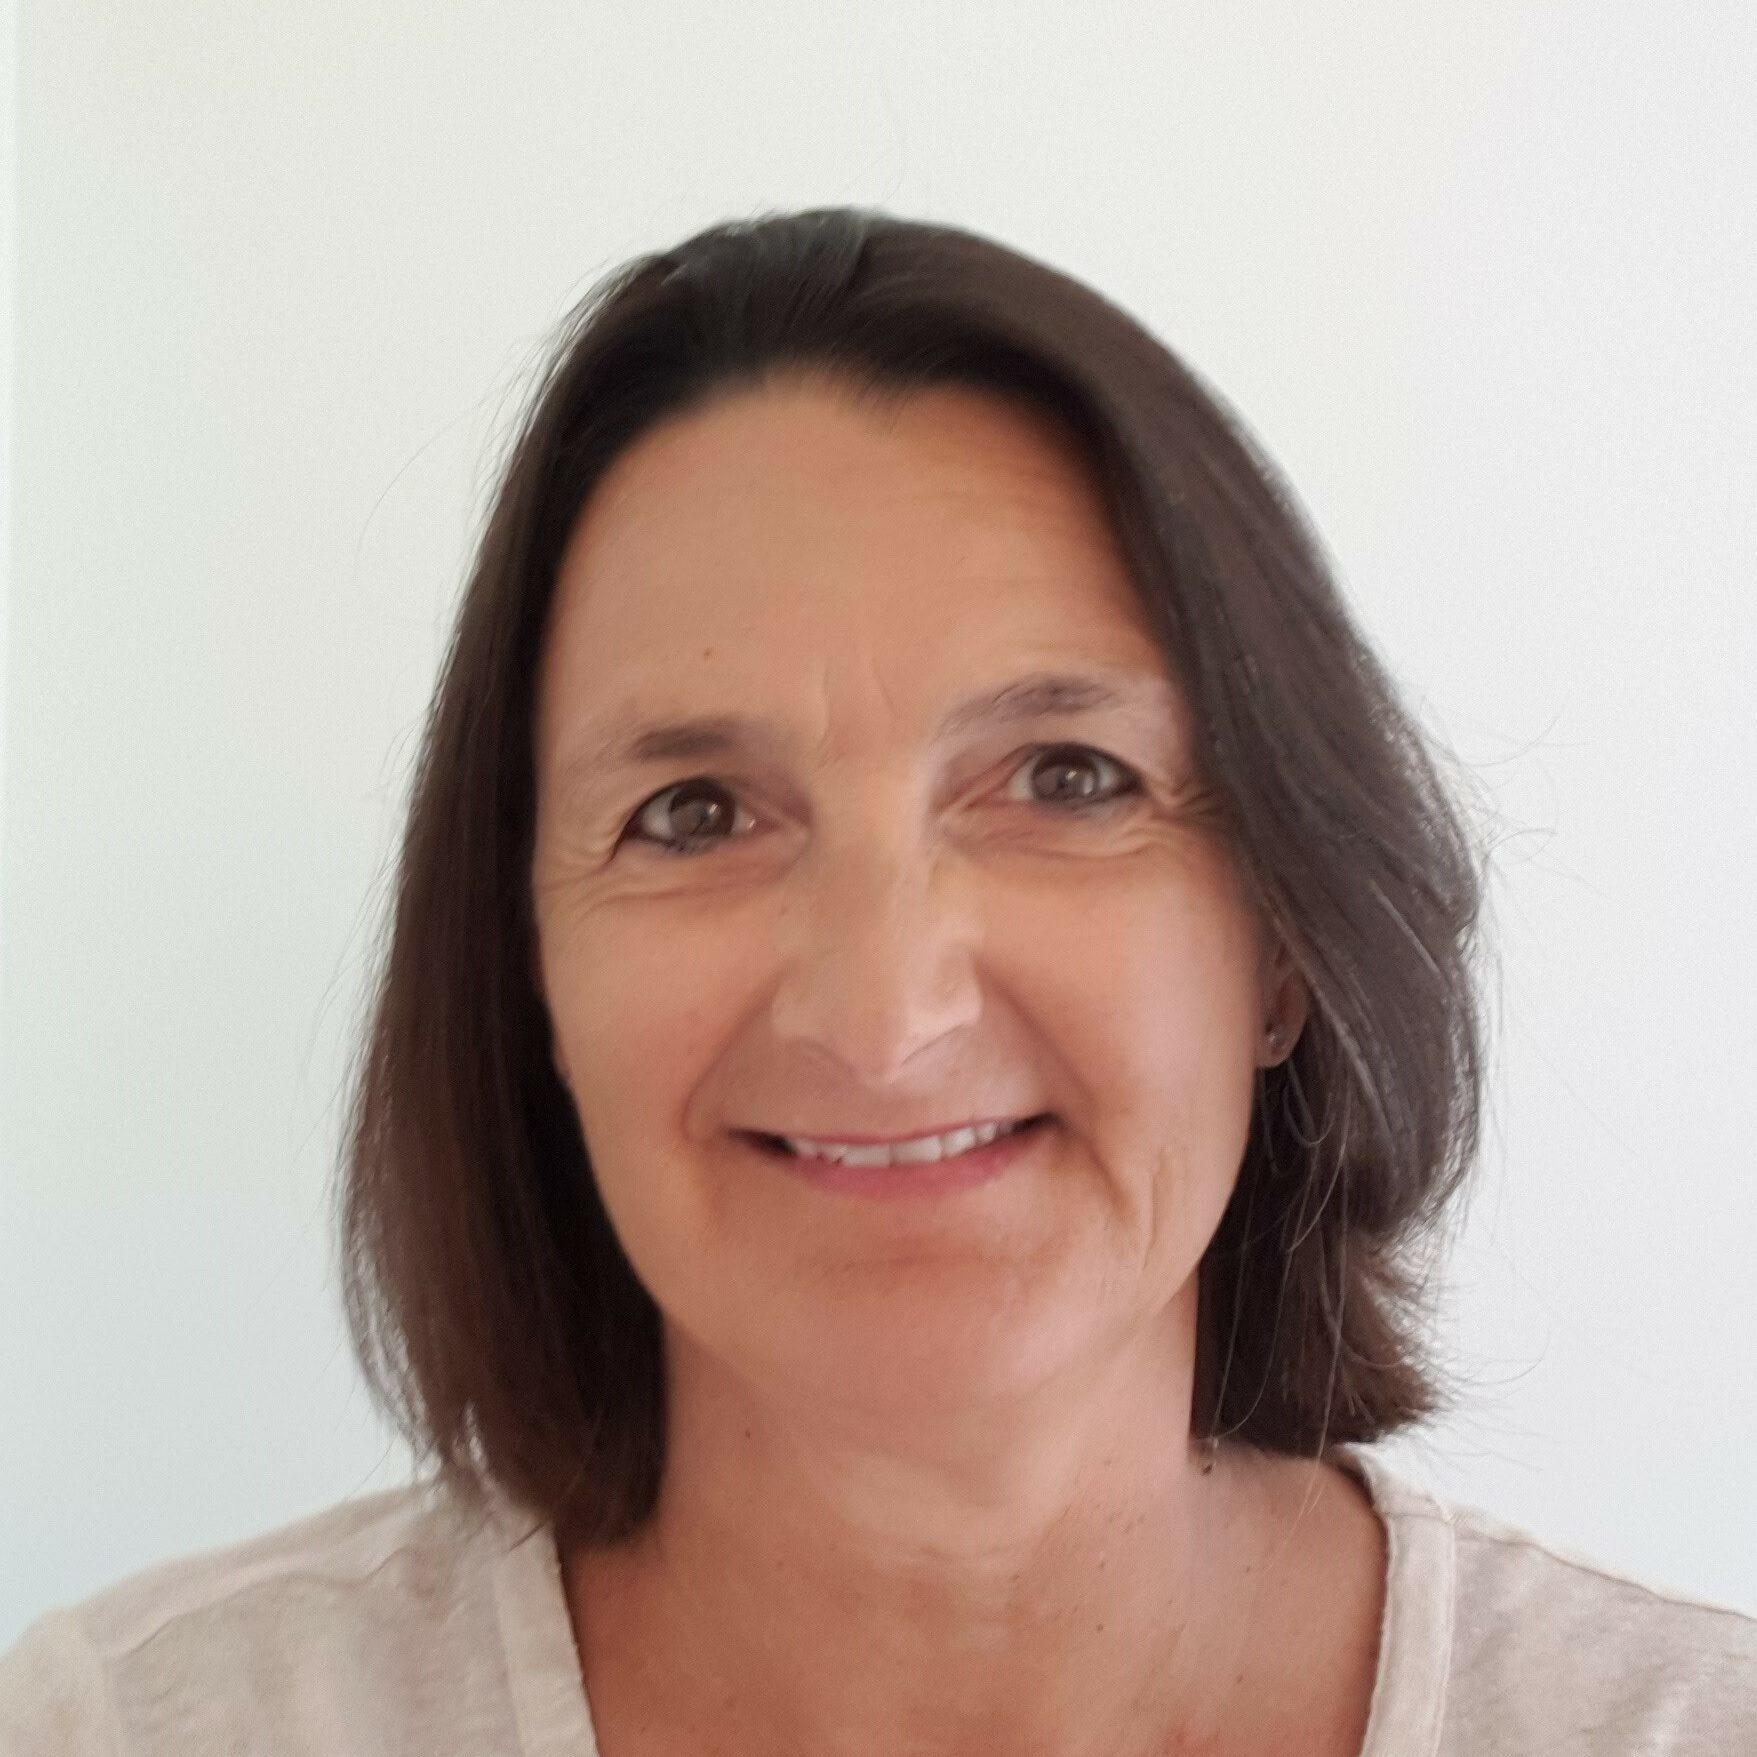 Ms. Christine Cardis